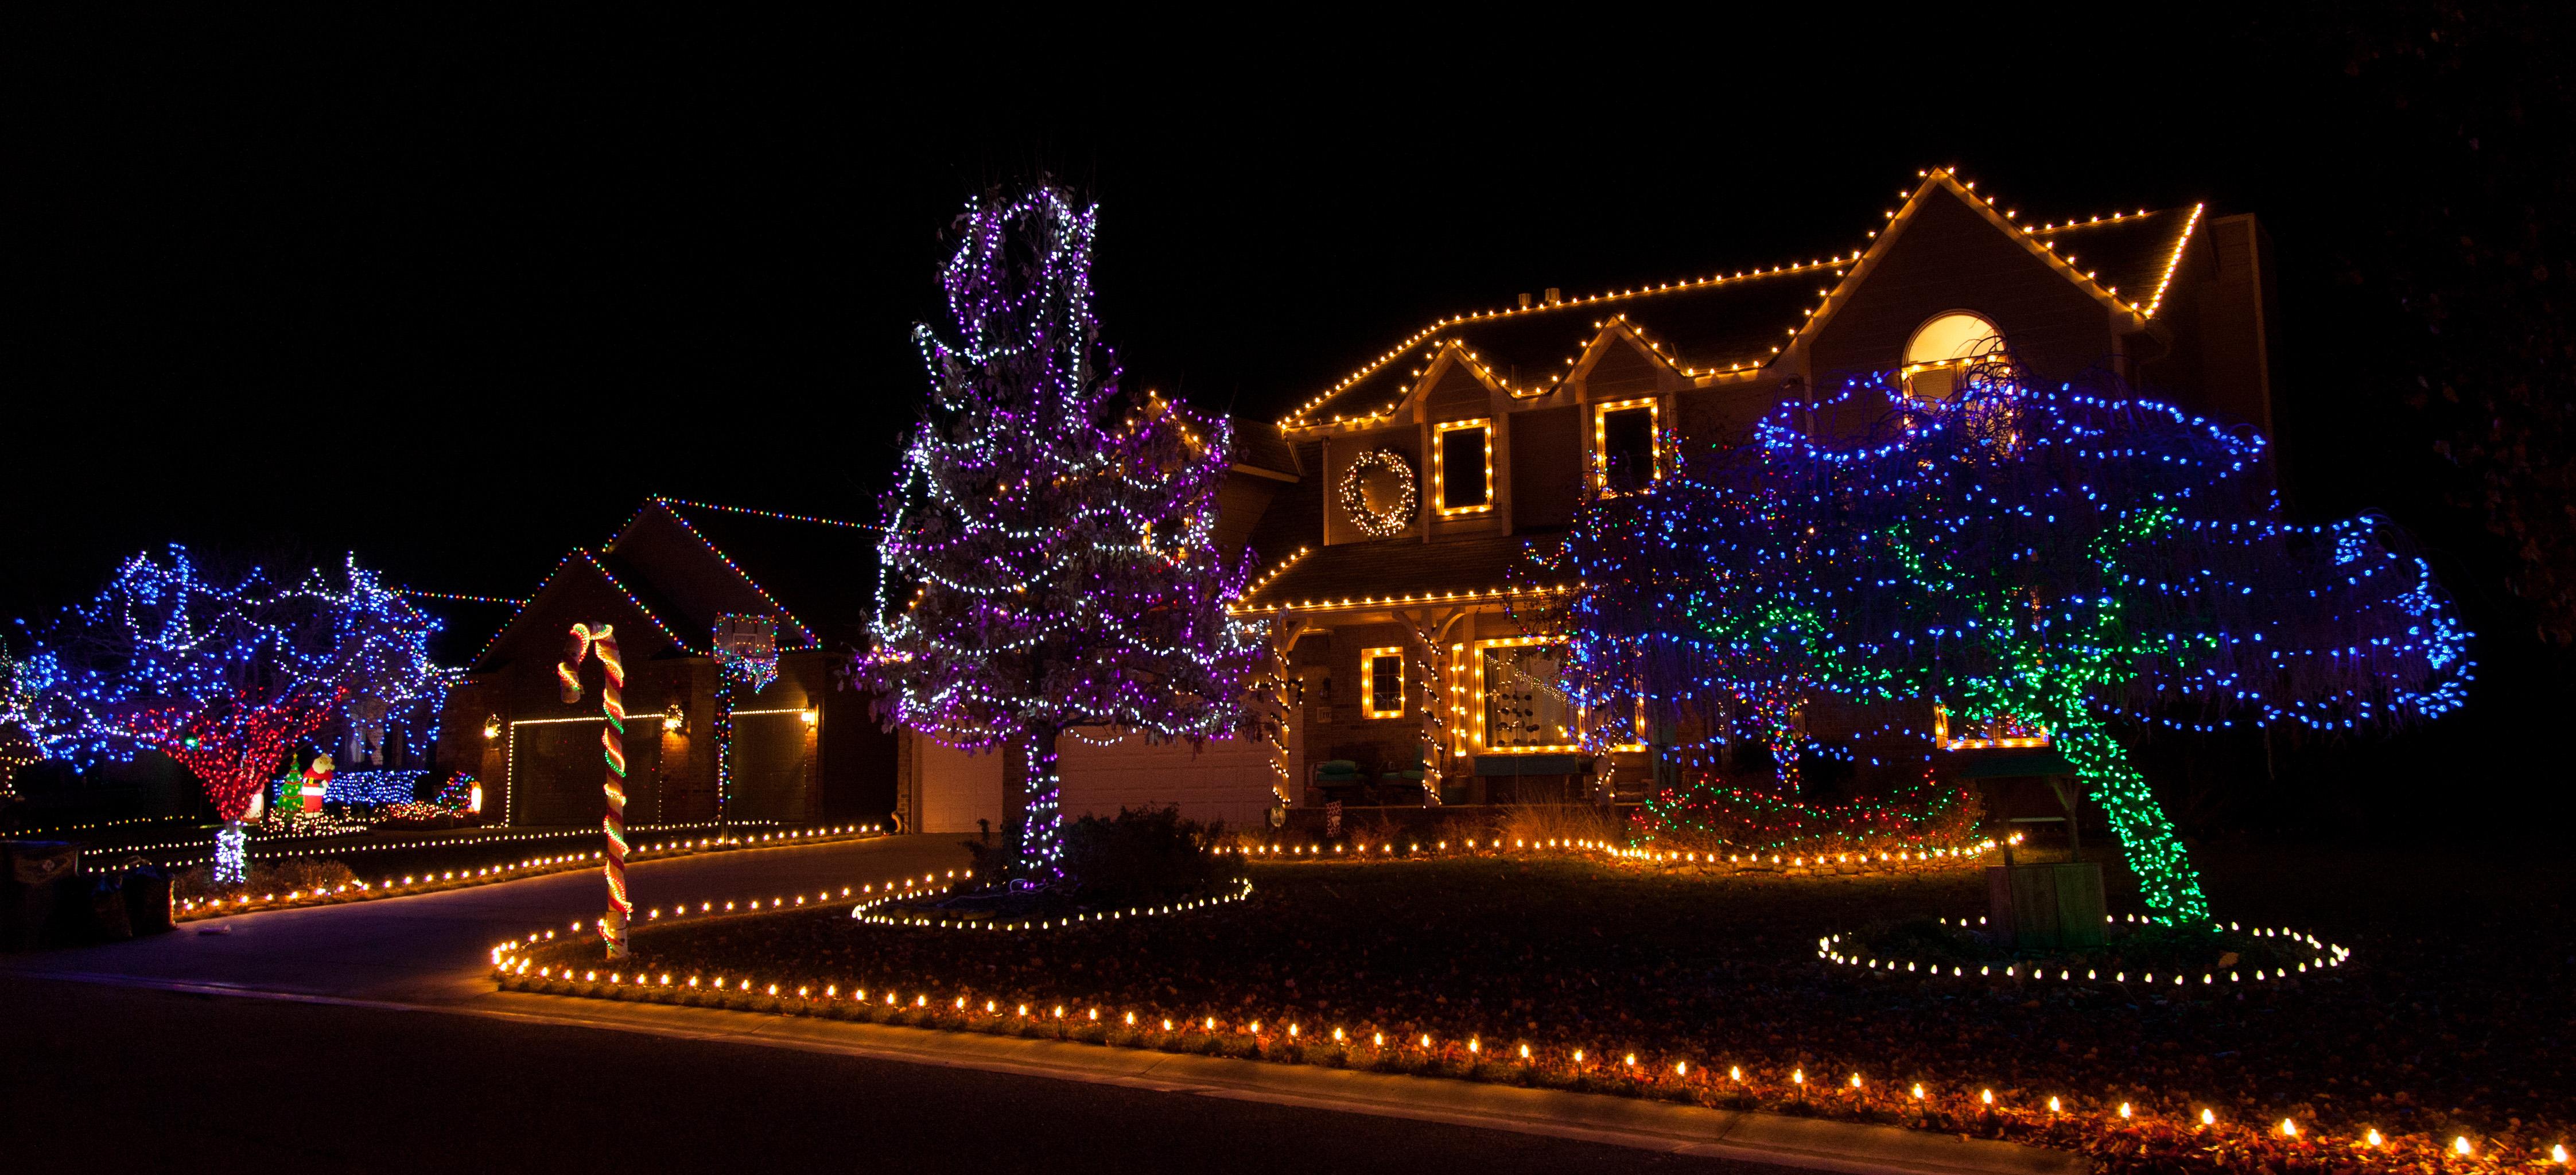 Colorful Christmas Lights on Candy Cane Lane